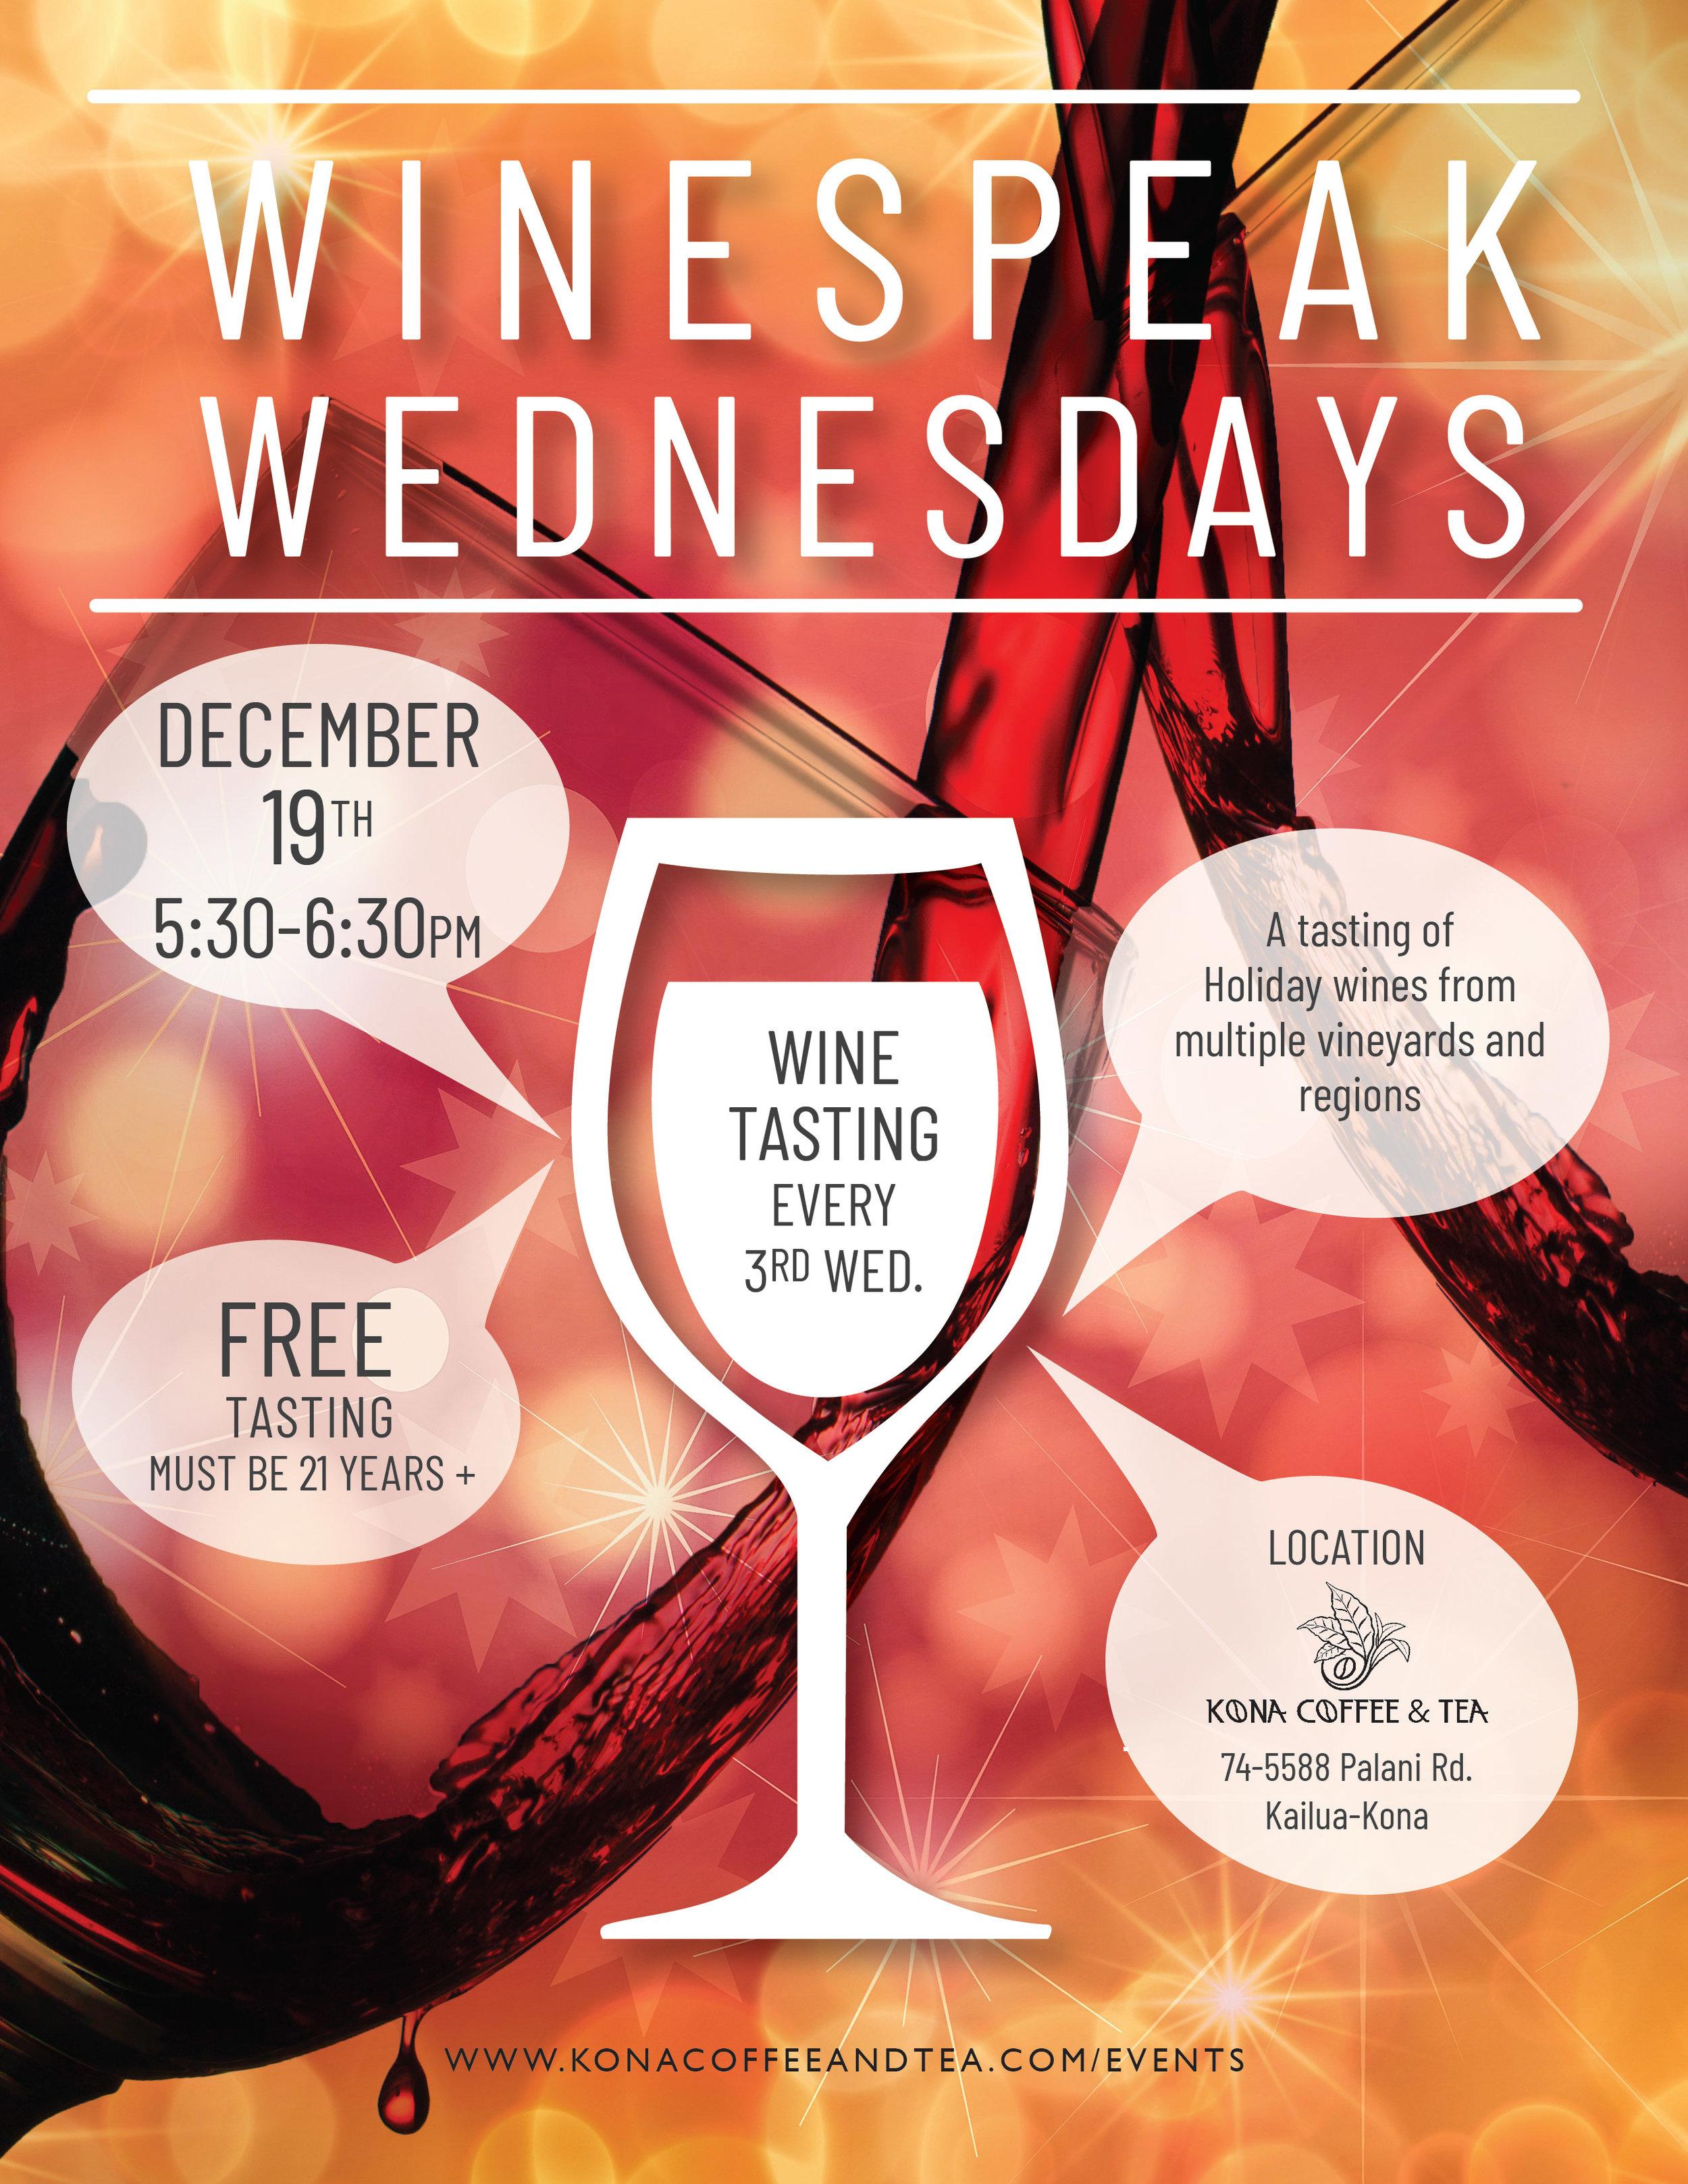 WEB_WineSpeak Wednesdays_12.19.18_KCTC-01.jpg